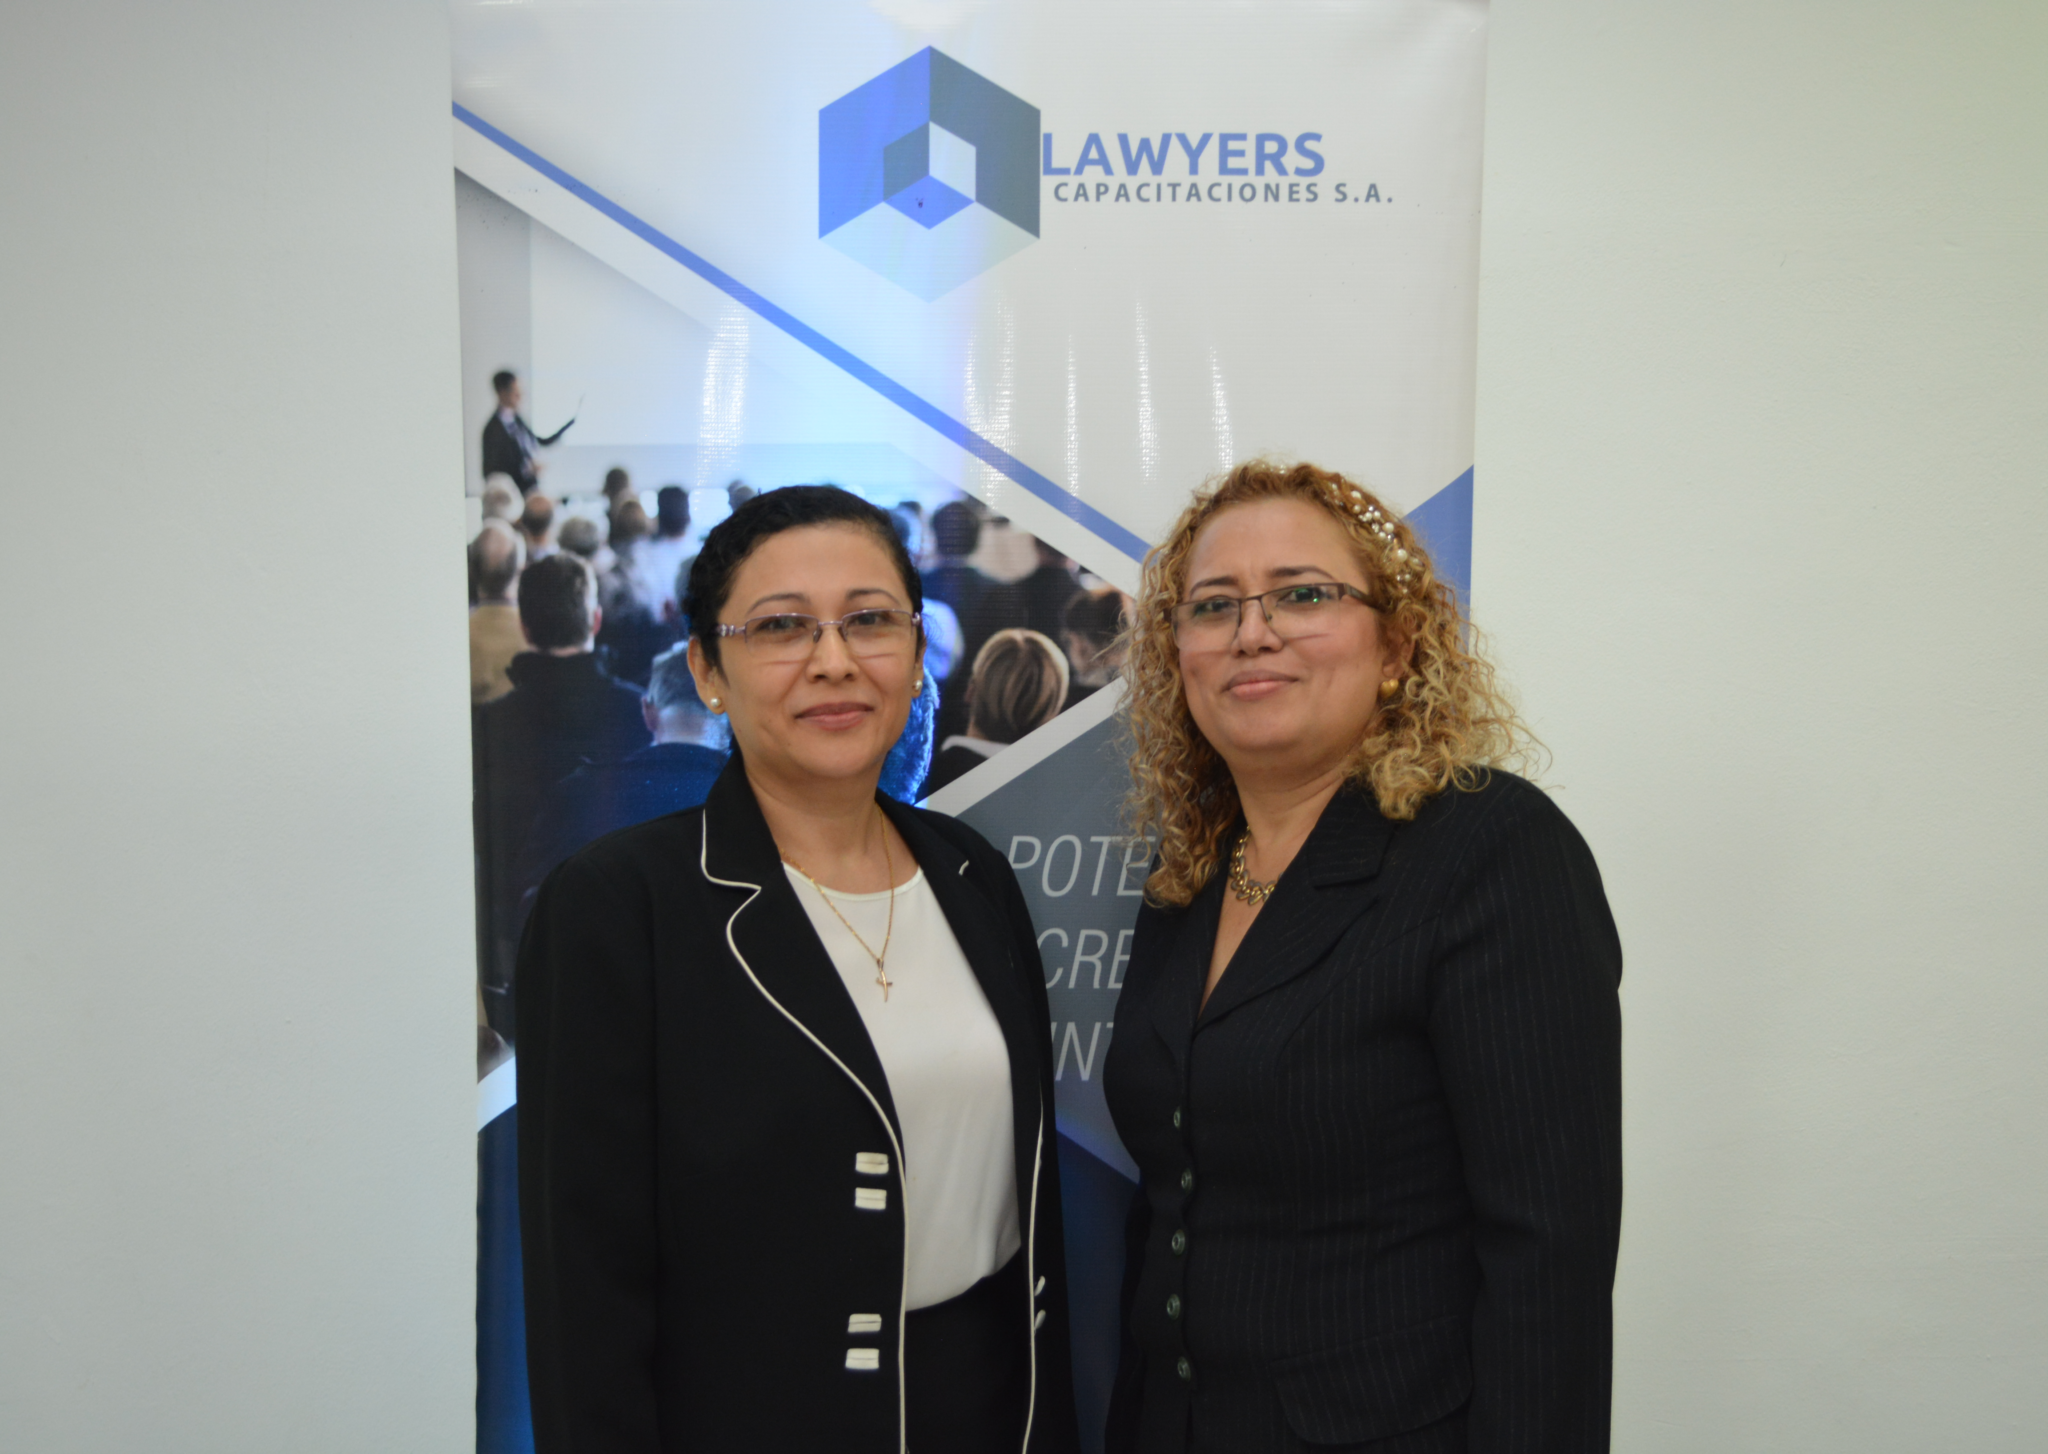 Dra Lourdes Corea. (Juez Séptimo Local Penal) / Dra Fatima Rosales (Juez Décimo Tercero Distrito de Juicio)